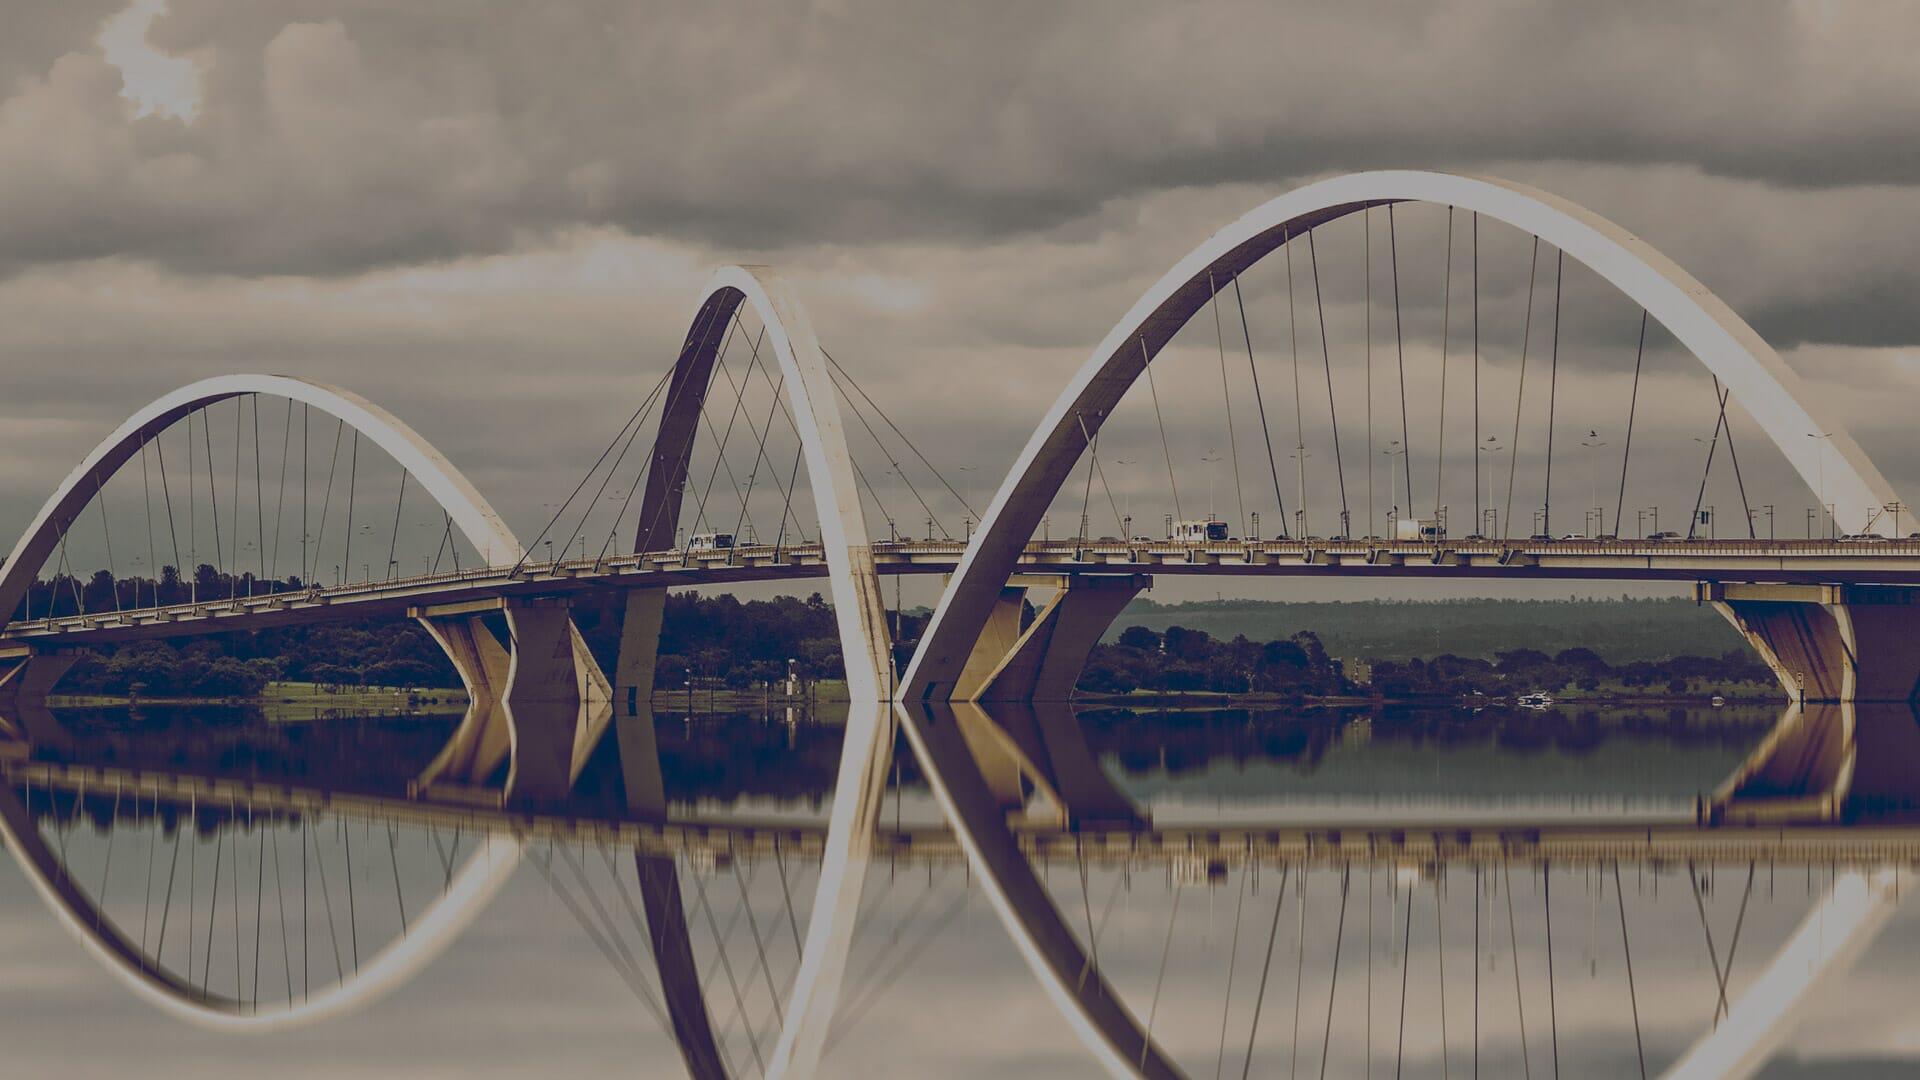 Northeast: Alternatives for financing urban infrastructure